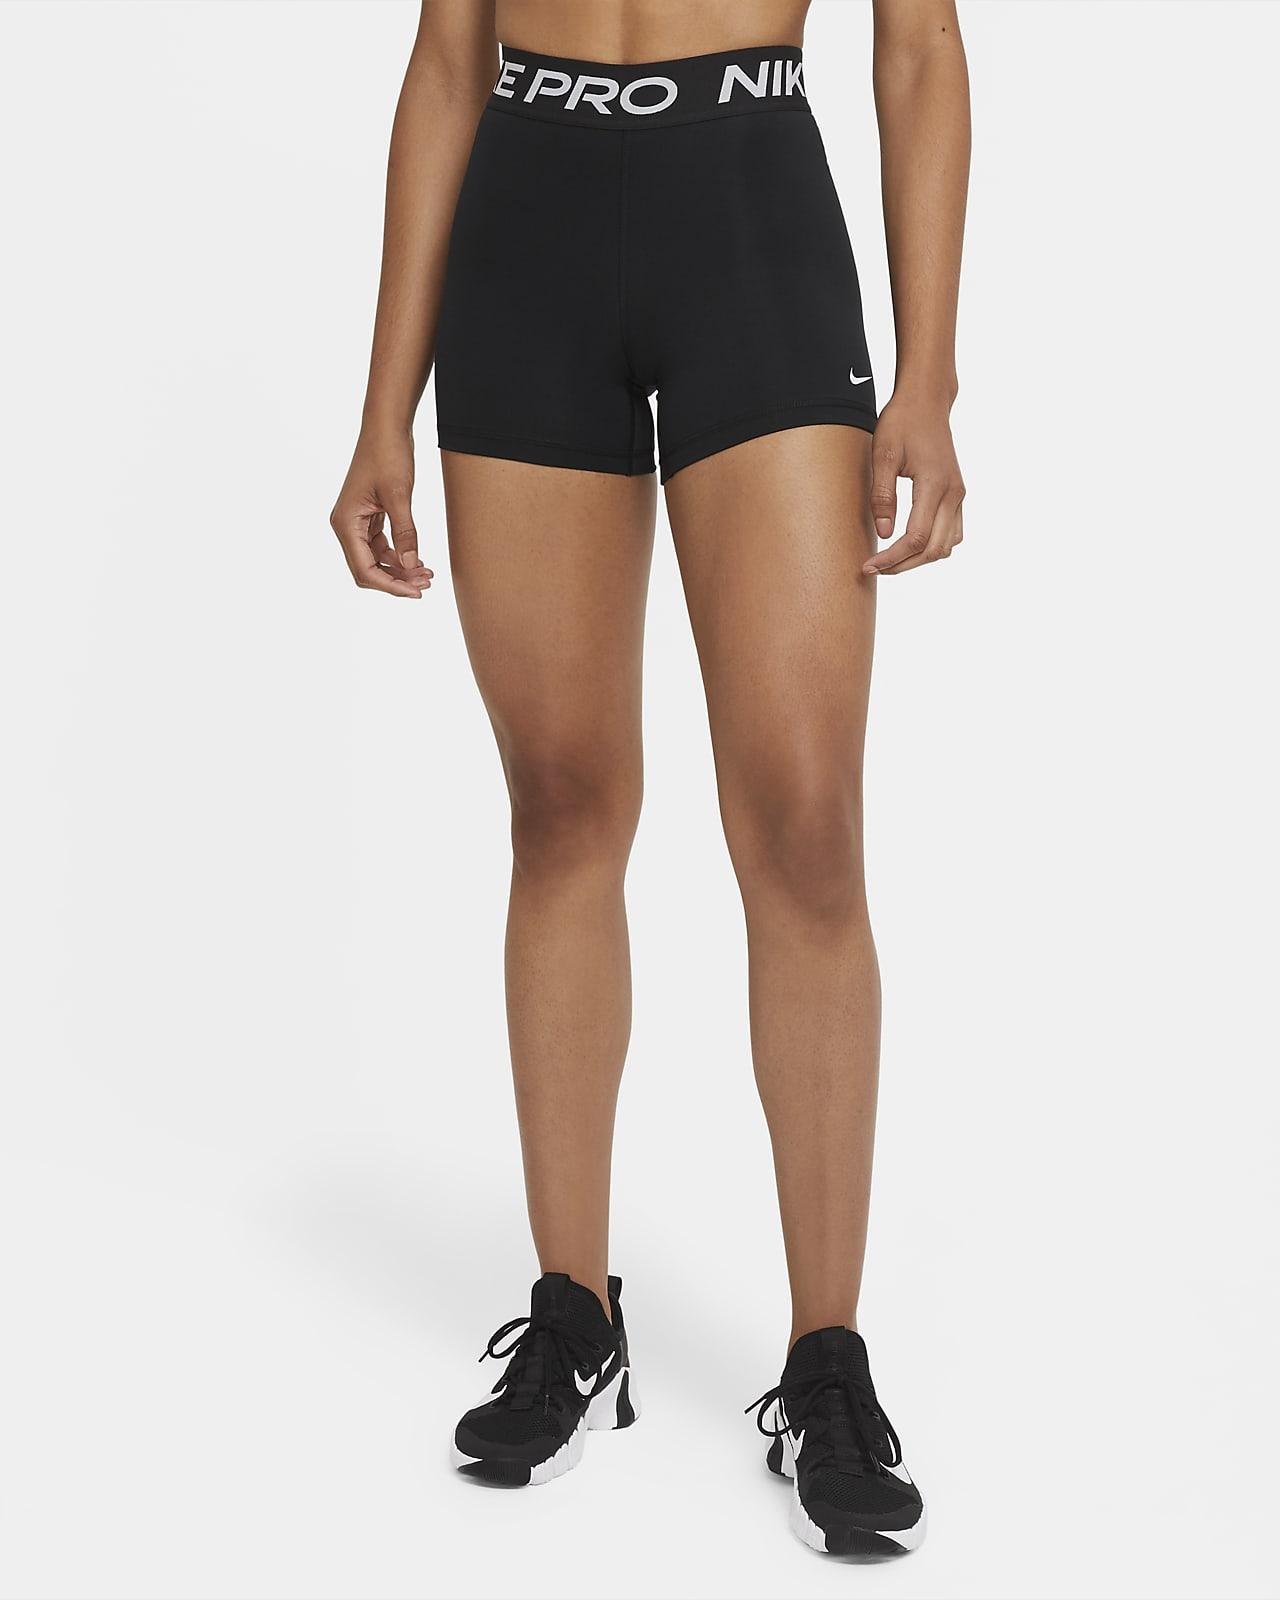 Nike Pro 365 Women's 13cm (approx.) Shorts